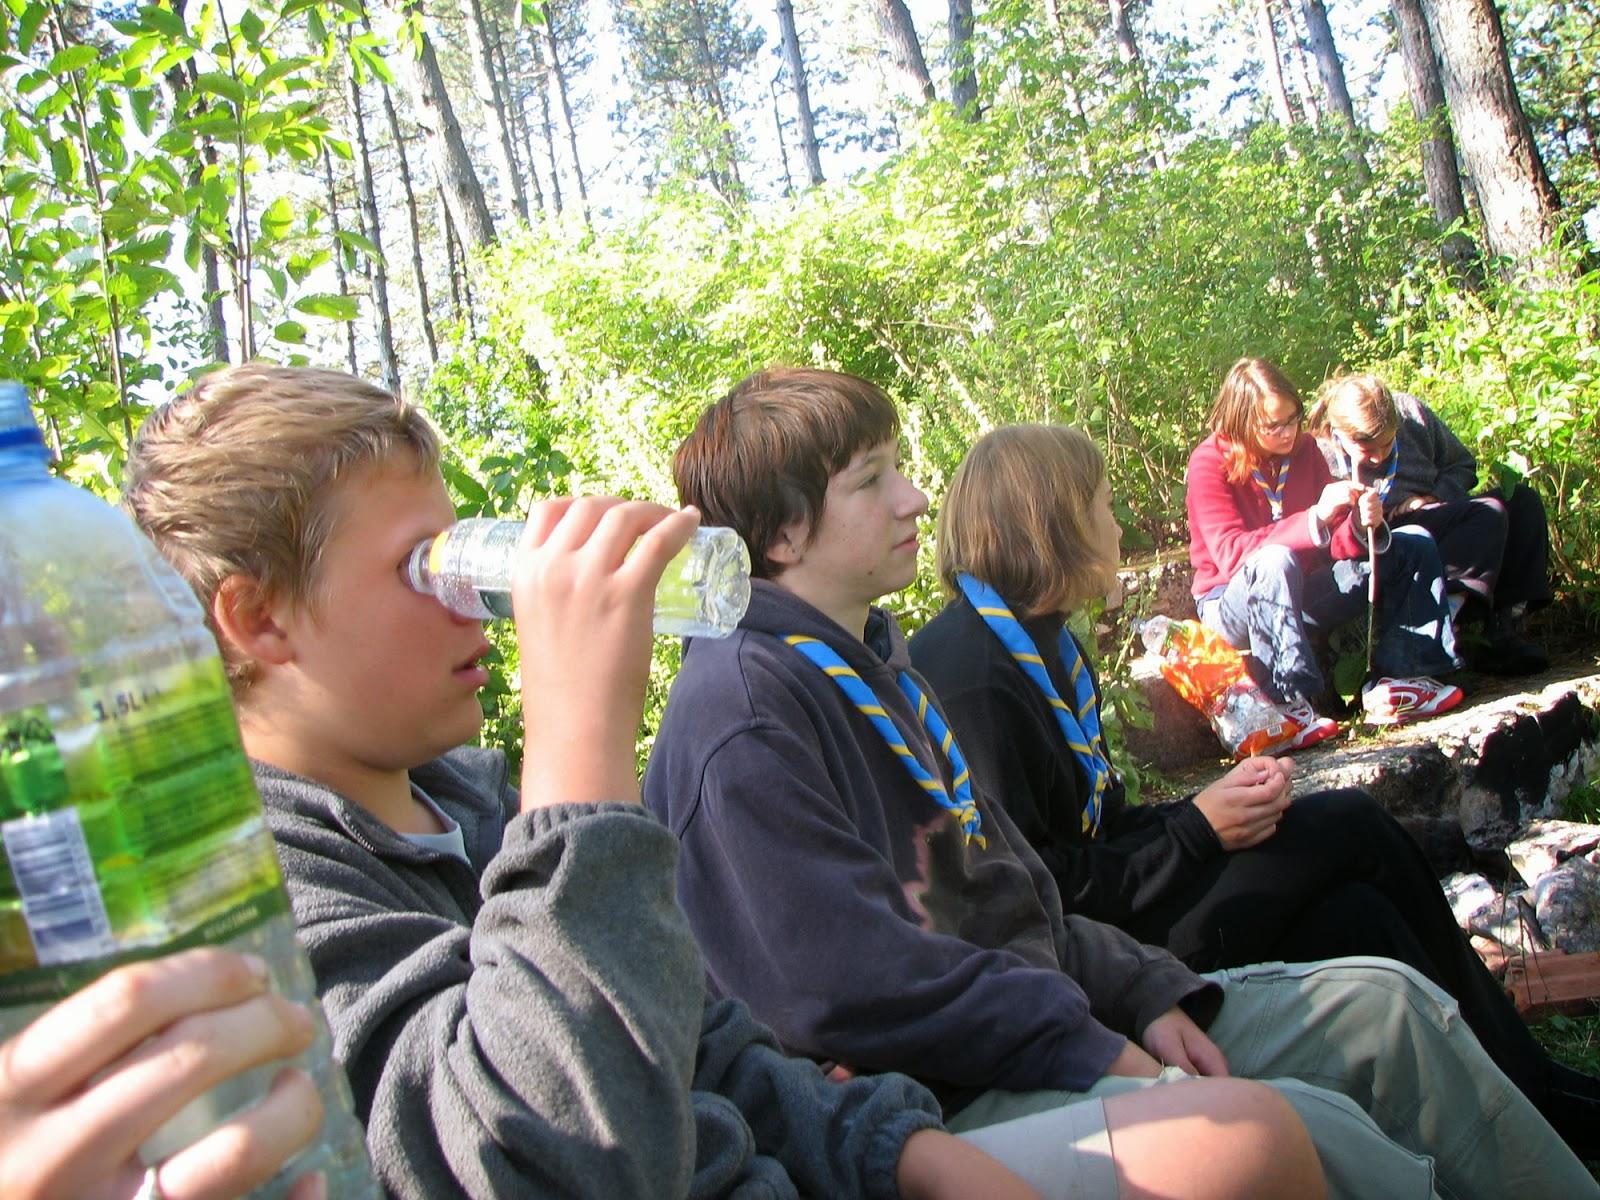 Prehod PP, Ilirska Bistrica 2005 - picture%2B118.jpg